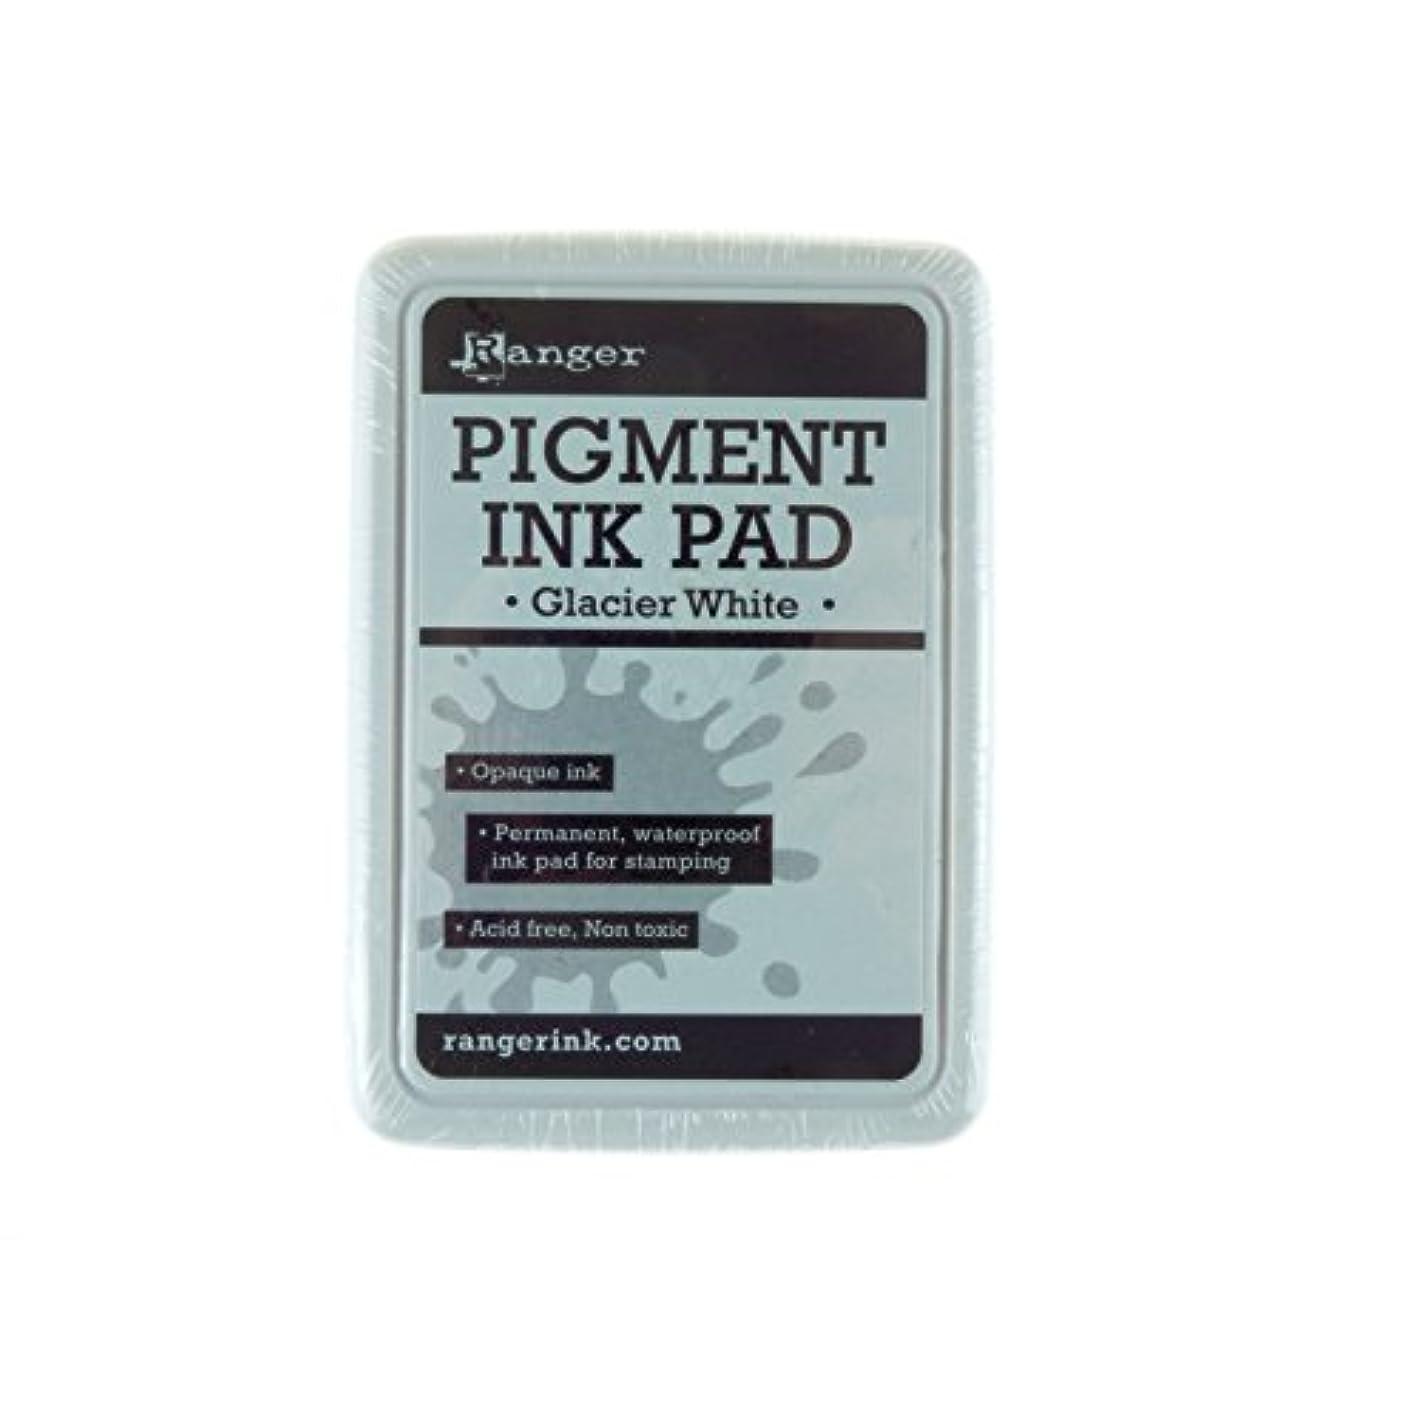 Ranger Pigment Ink Pad-Glacier White